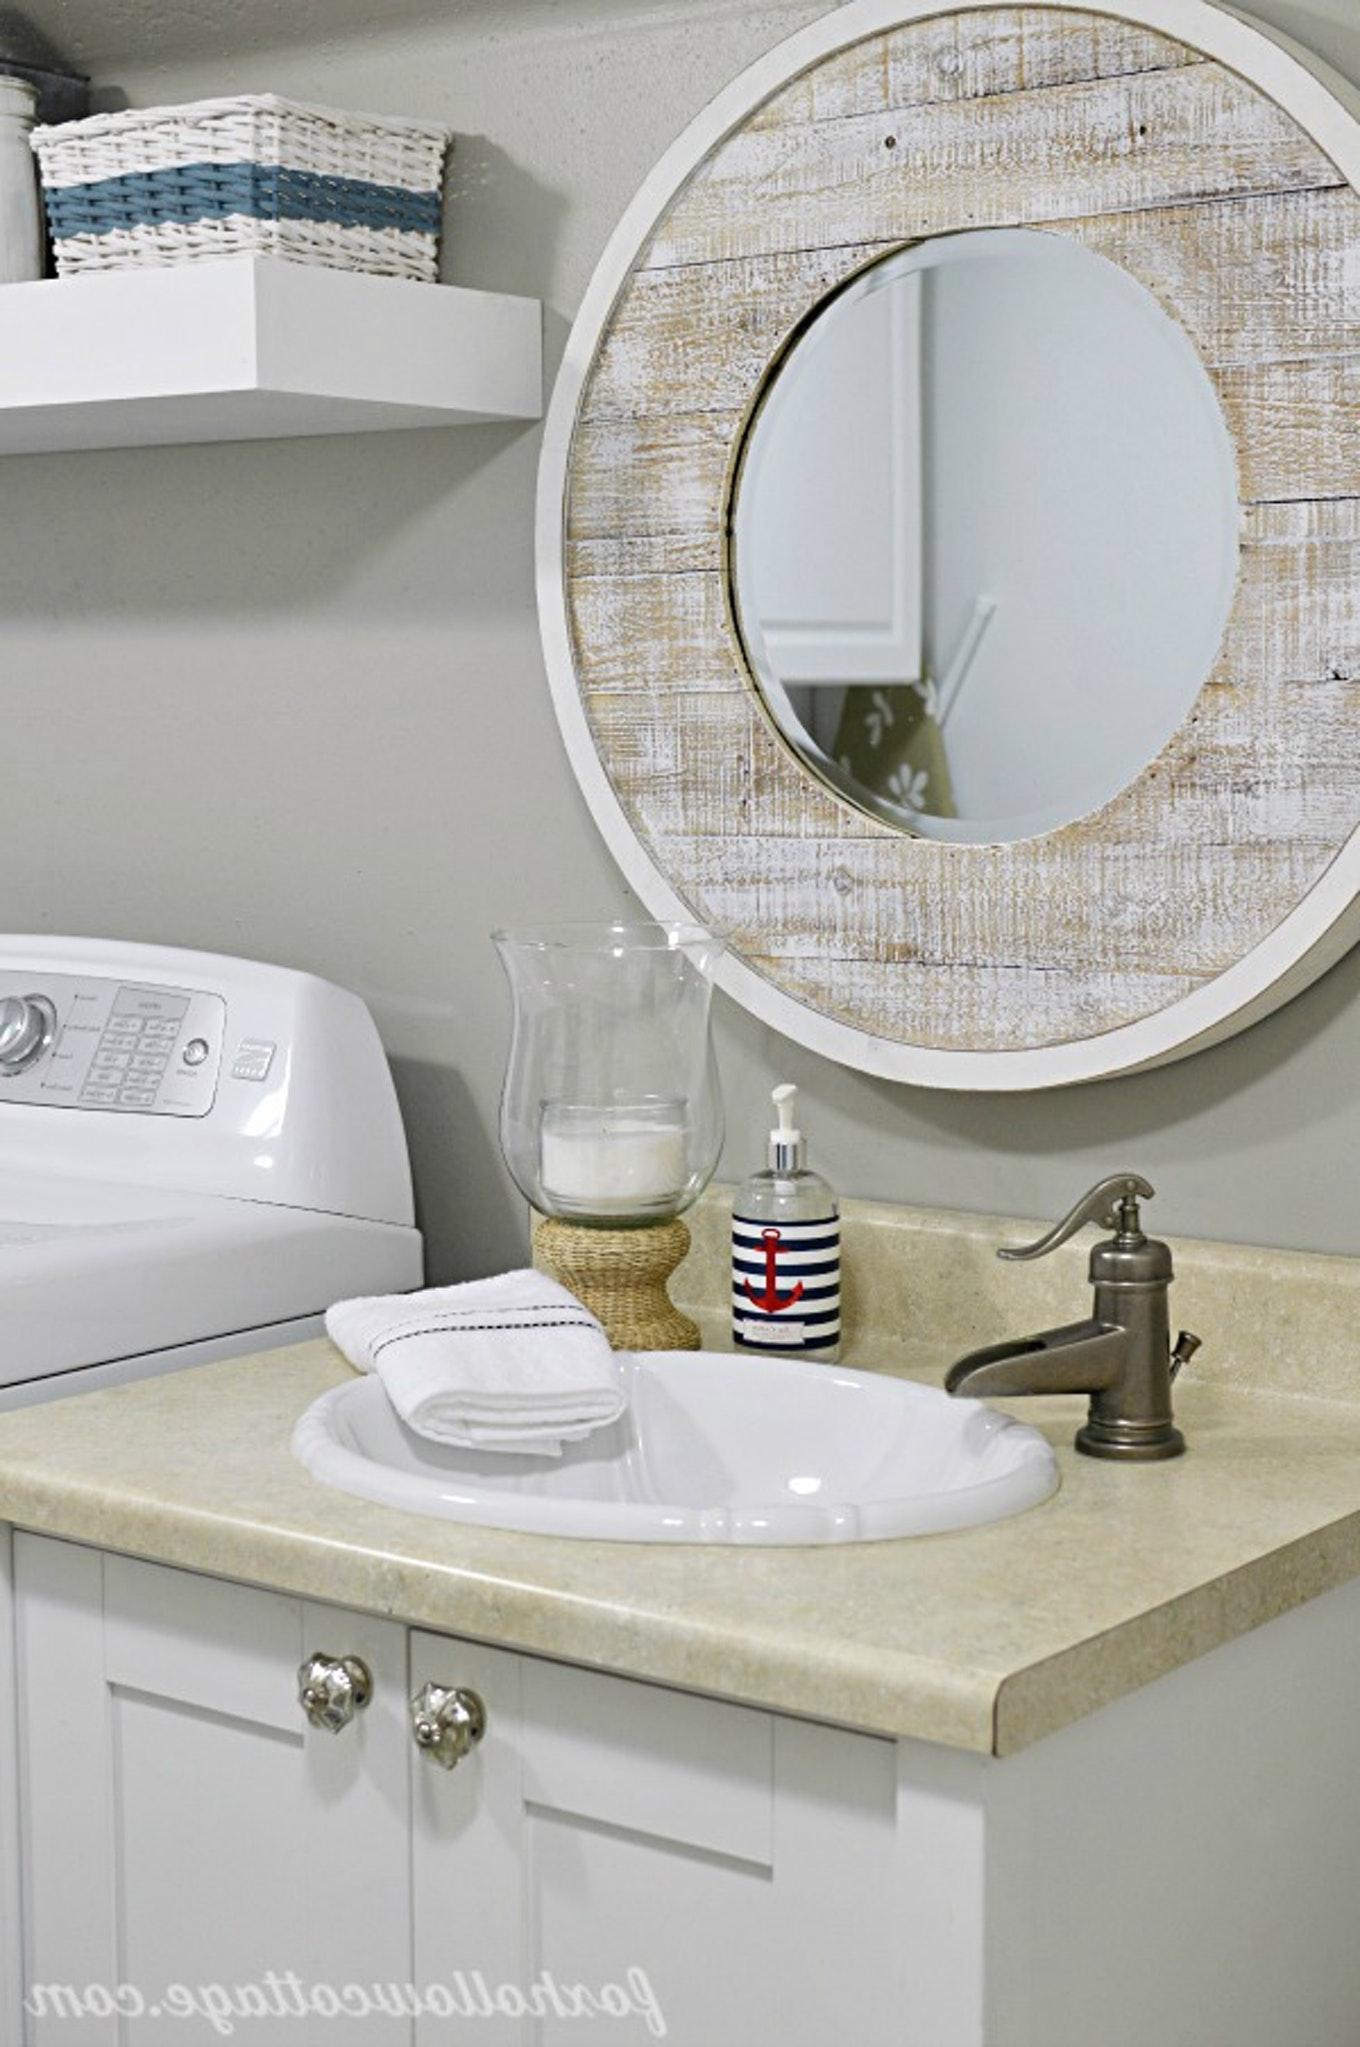 Bathroom Mirrors Beach Theme 1360x2047 Wallpaper Teahub Io